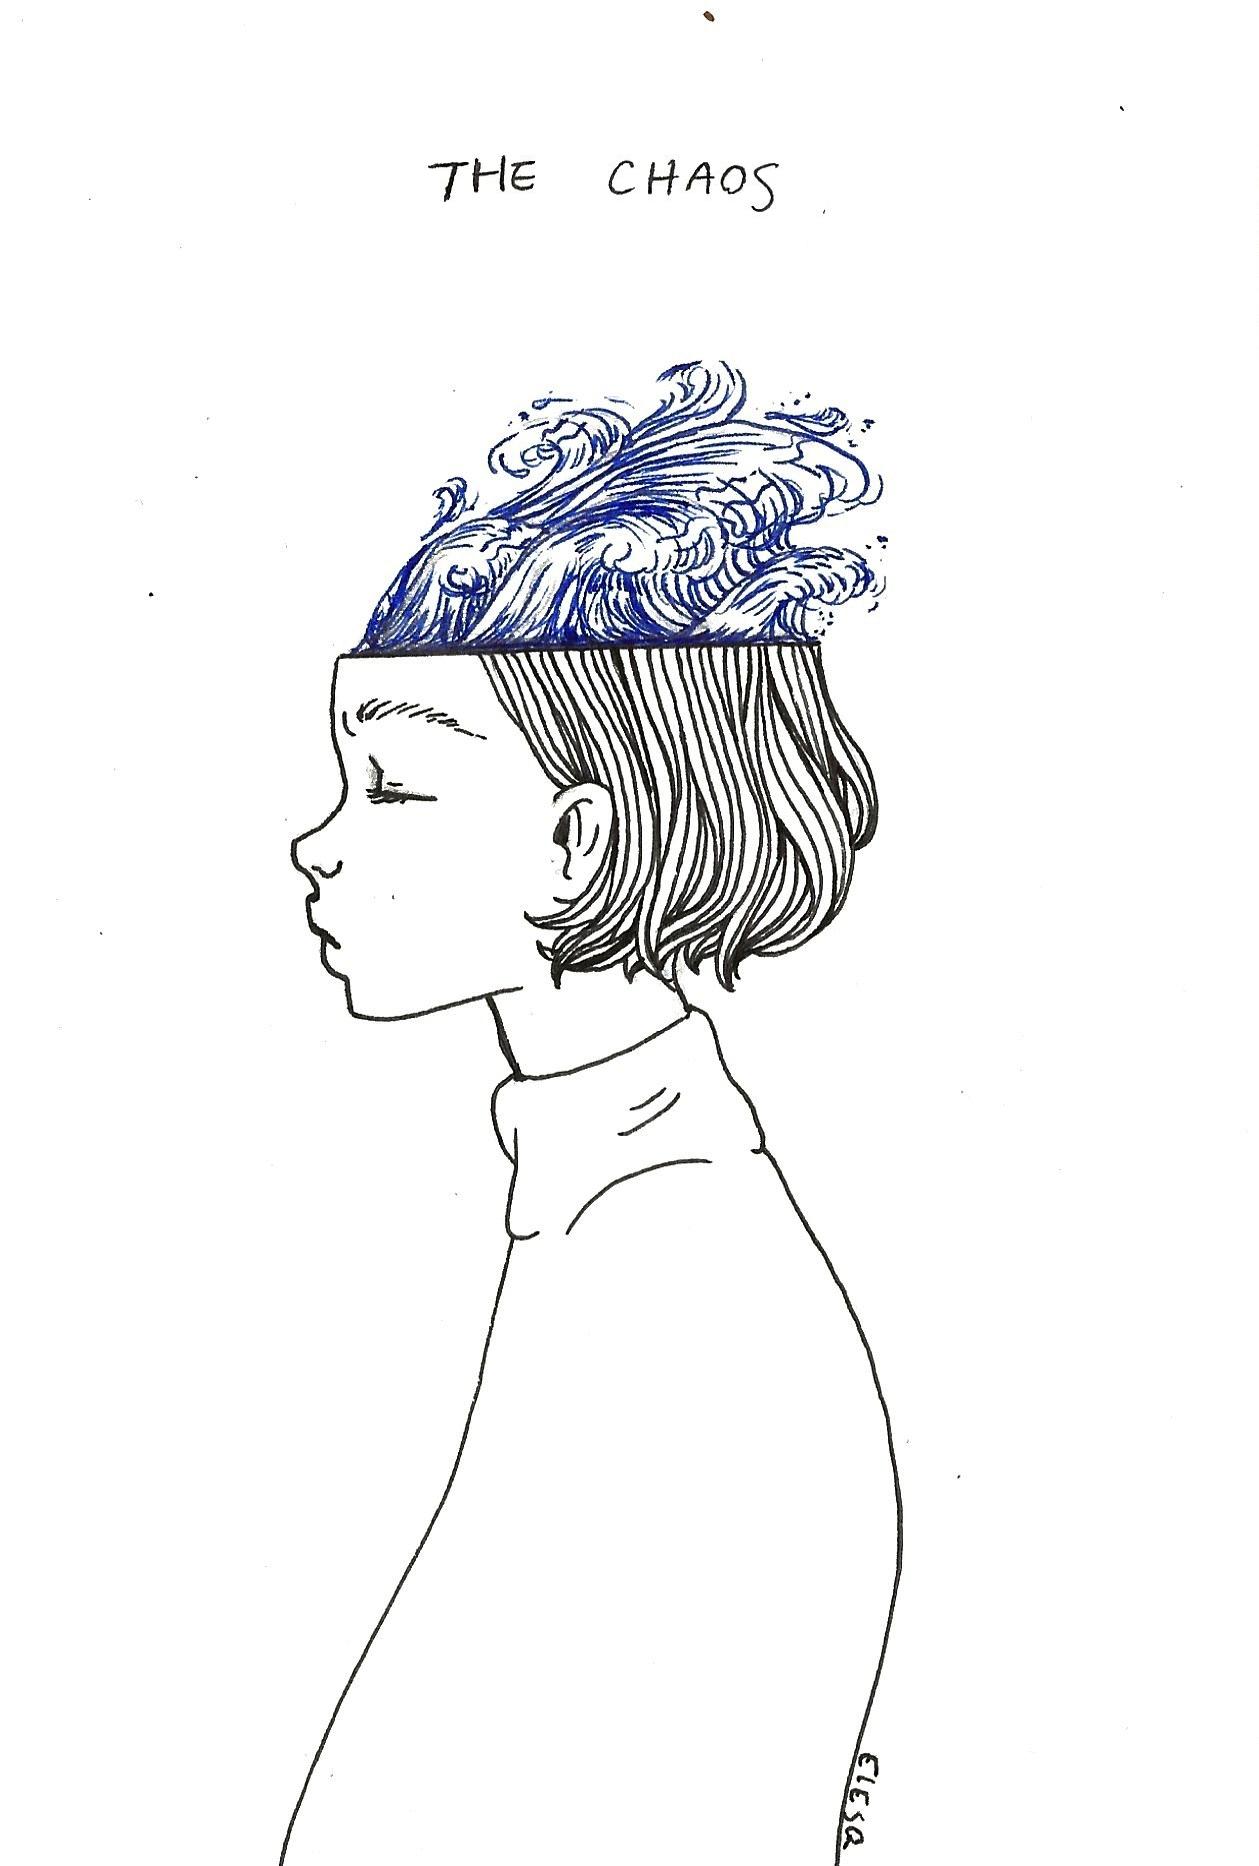 Calm clipart chaos. Ebriosity journal the mind